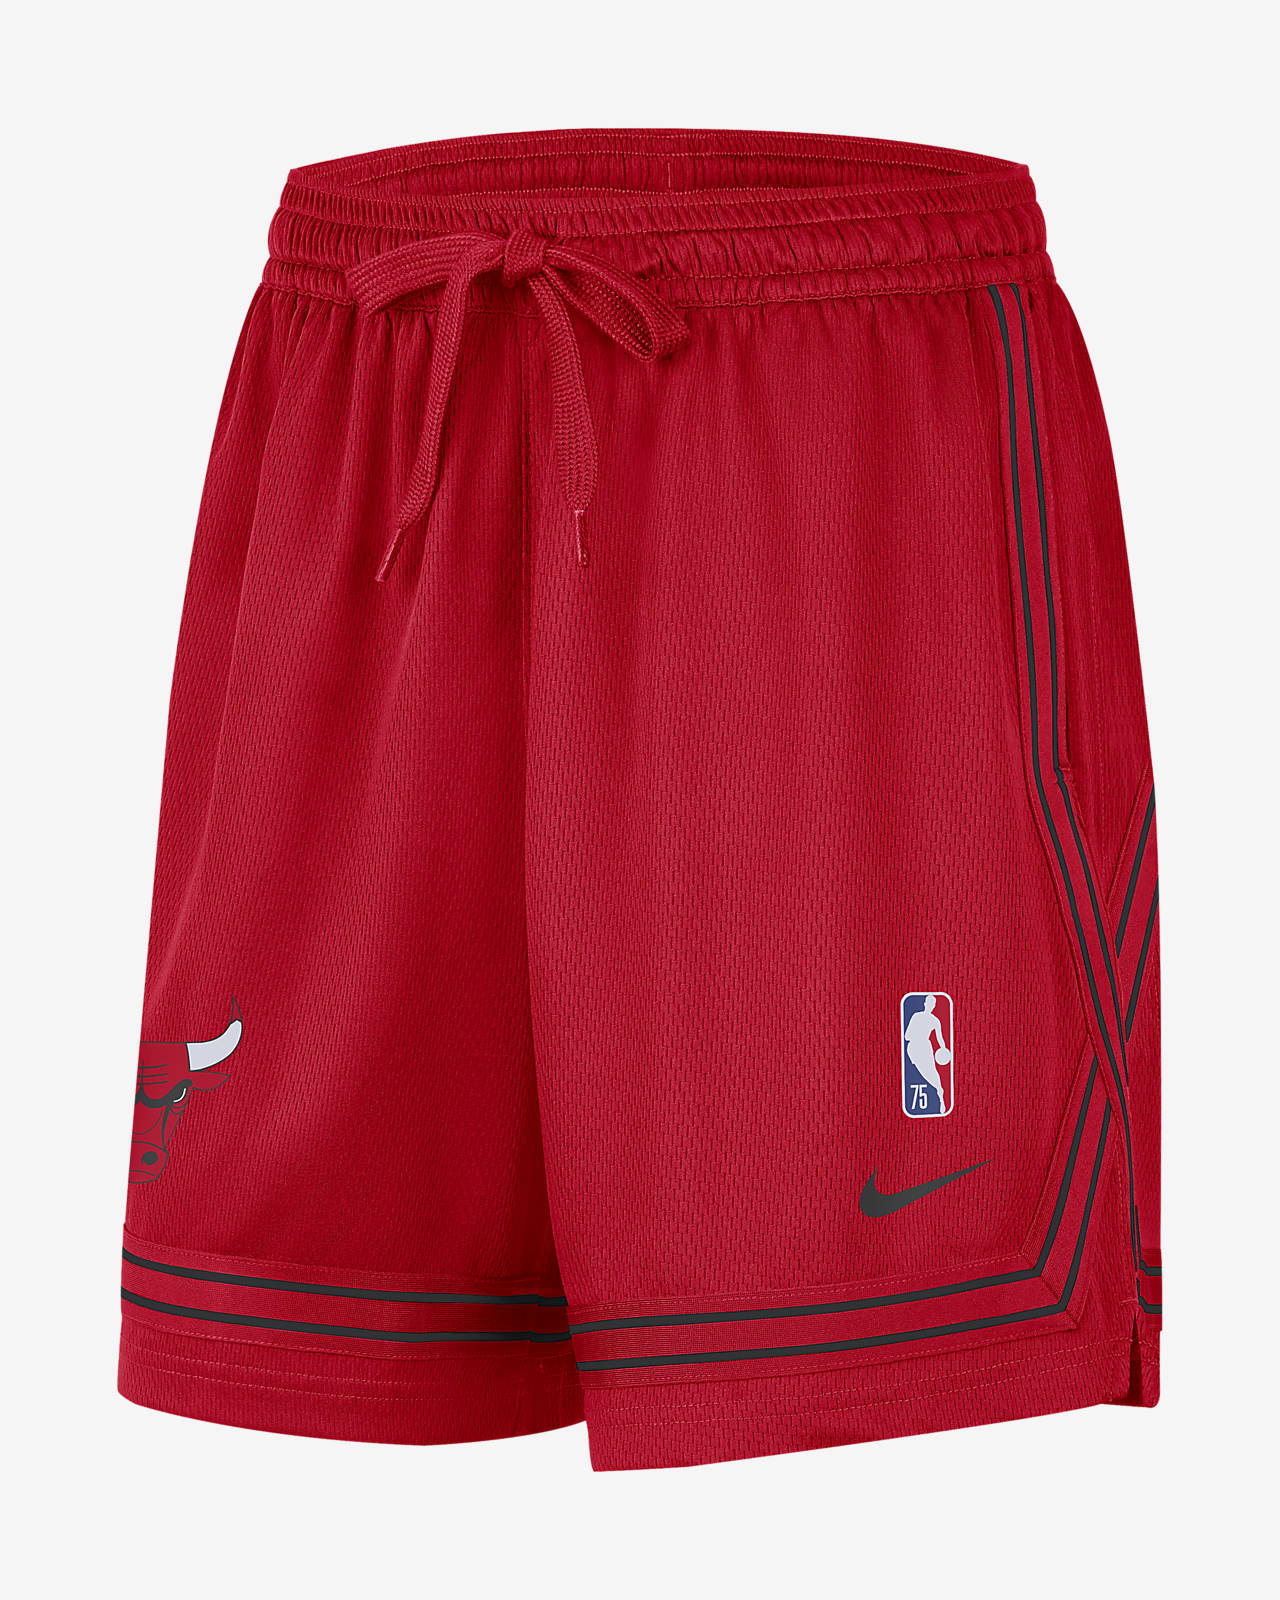 Chicago Bulls Courtside Nike NBA-damesshorts